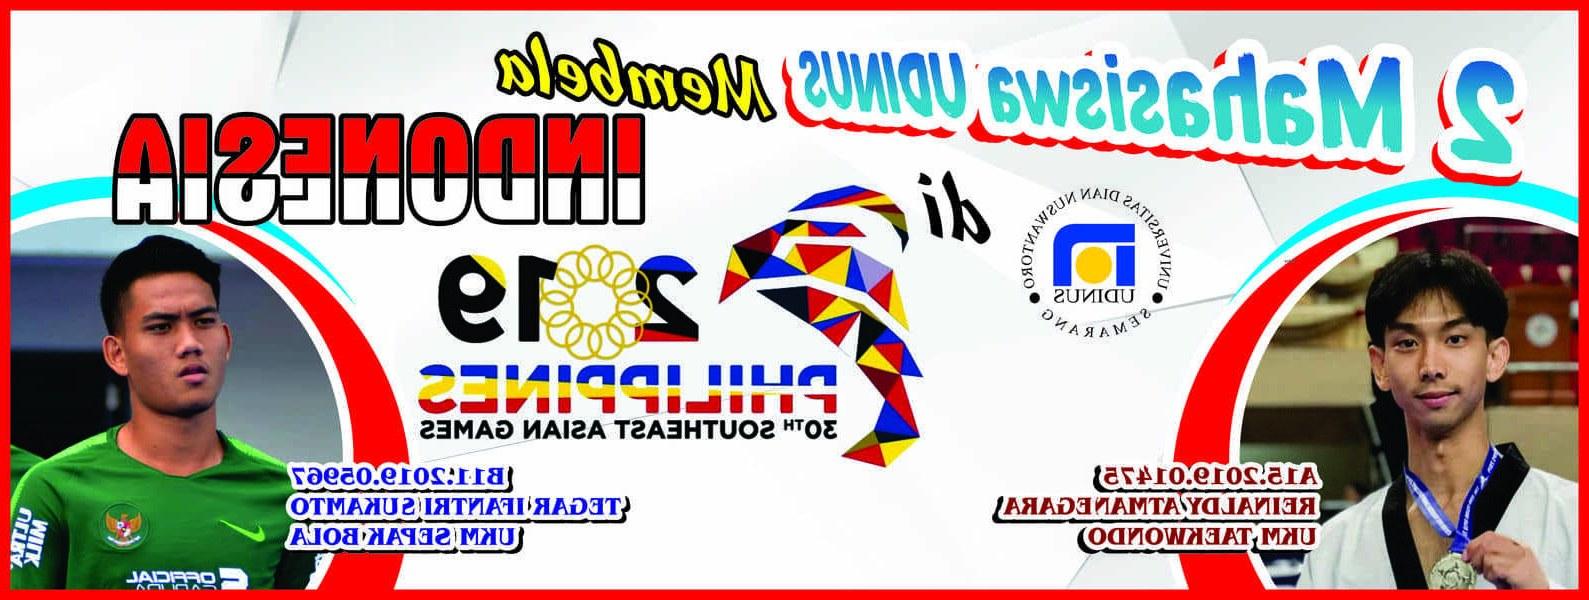 Ide Baju Pengantin Muslim Modern 2016 Dddy Universitas Dian Nuswantoro [udinus]